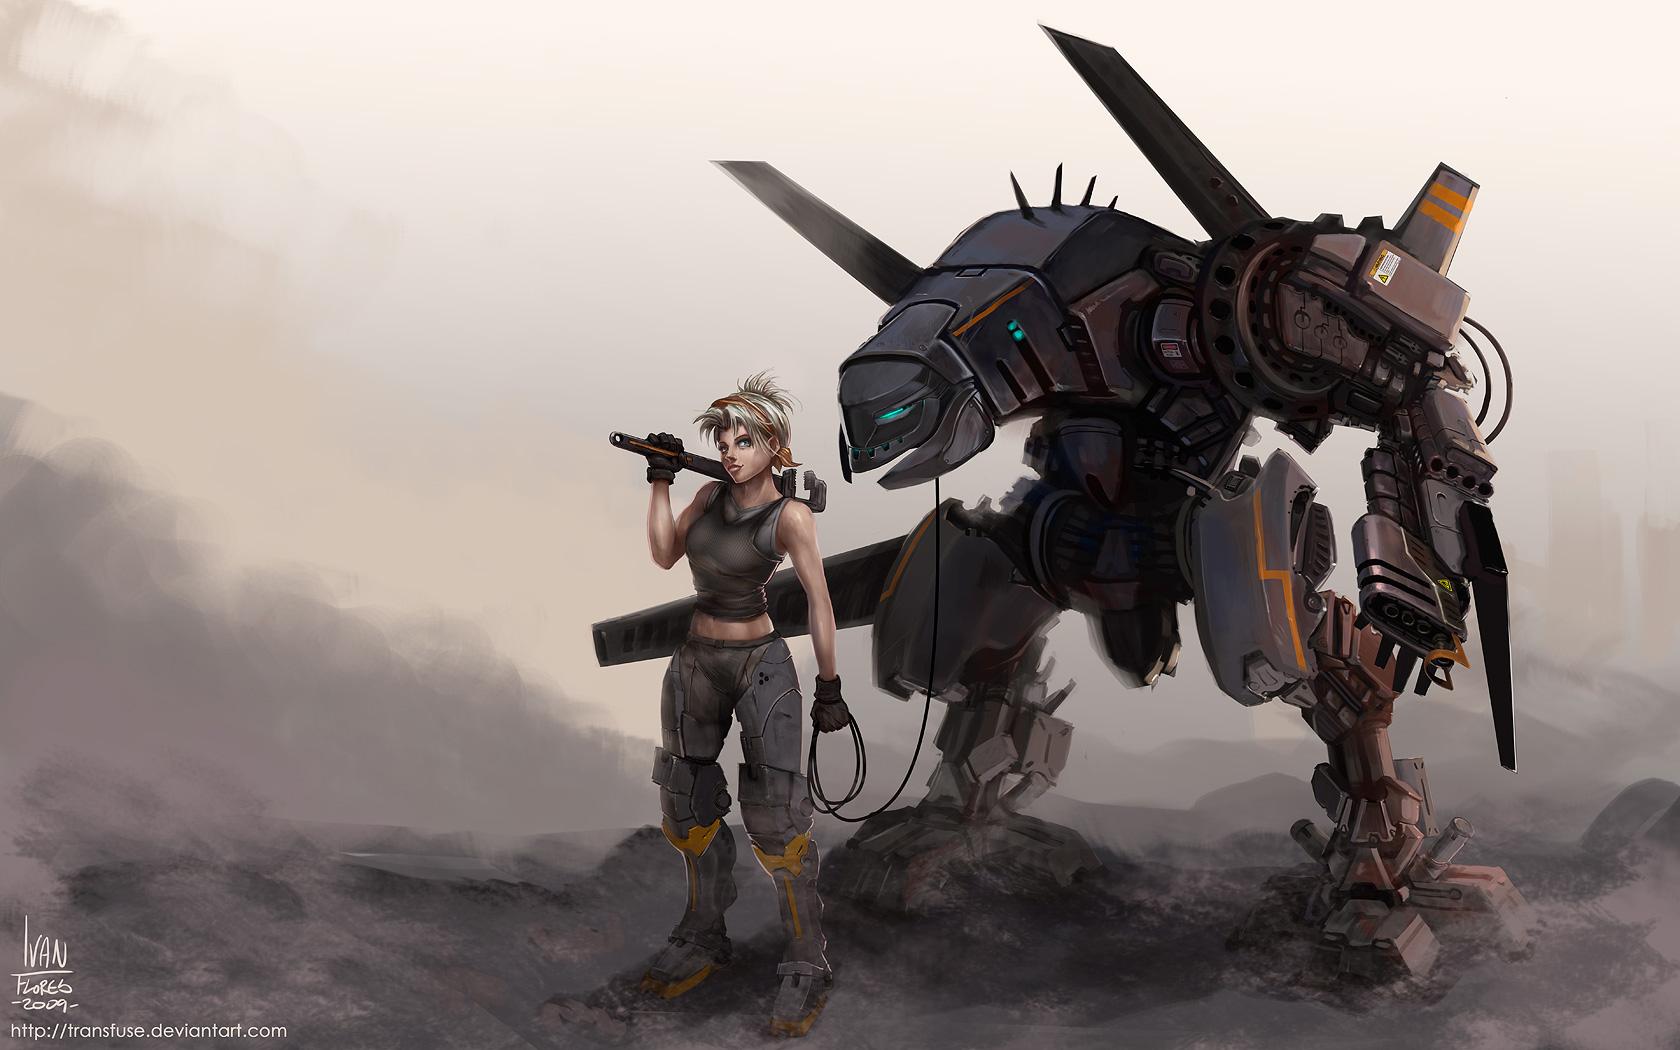 3d badass girl destroyed by mutants - 1 8